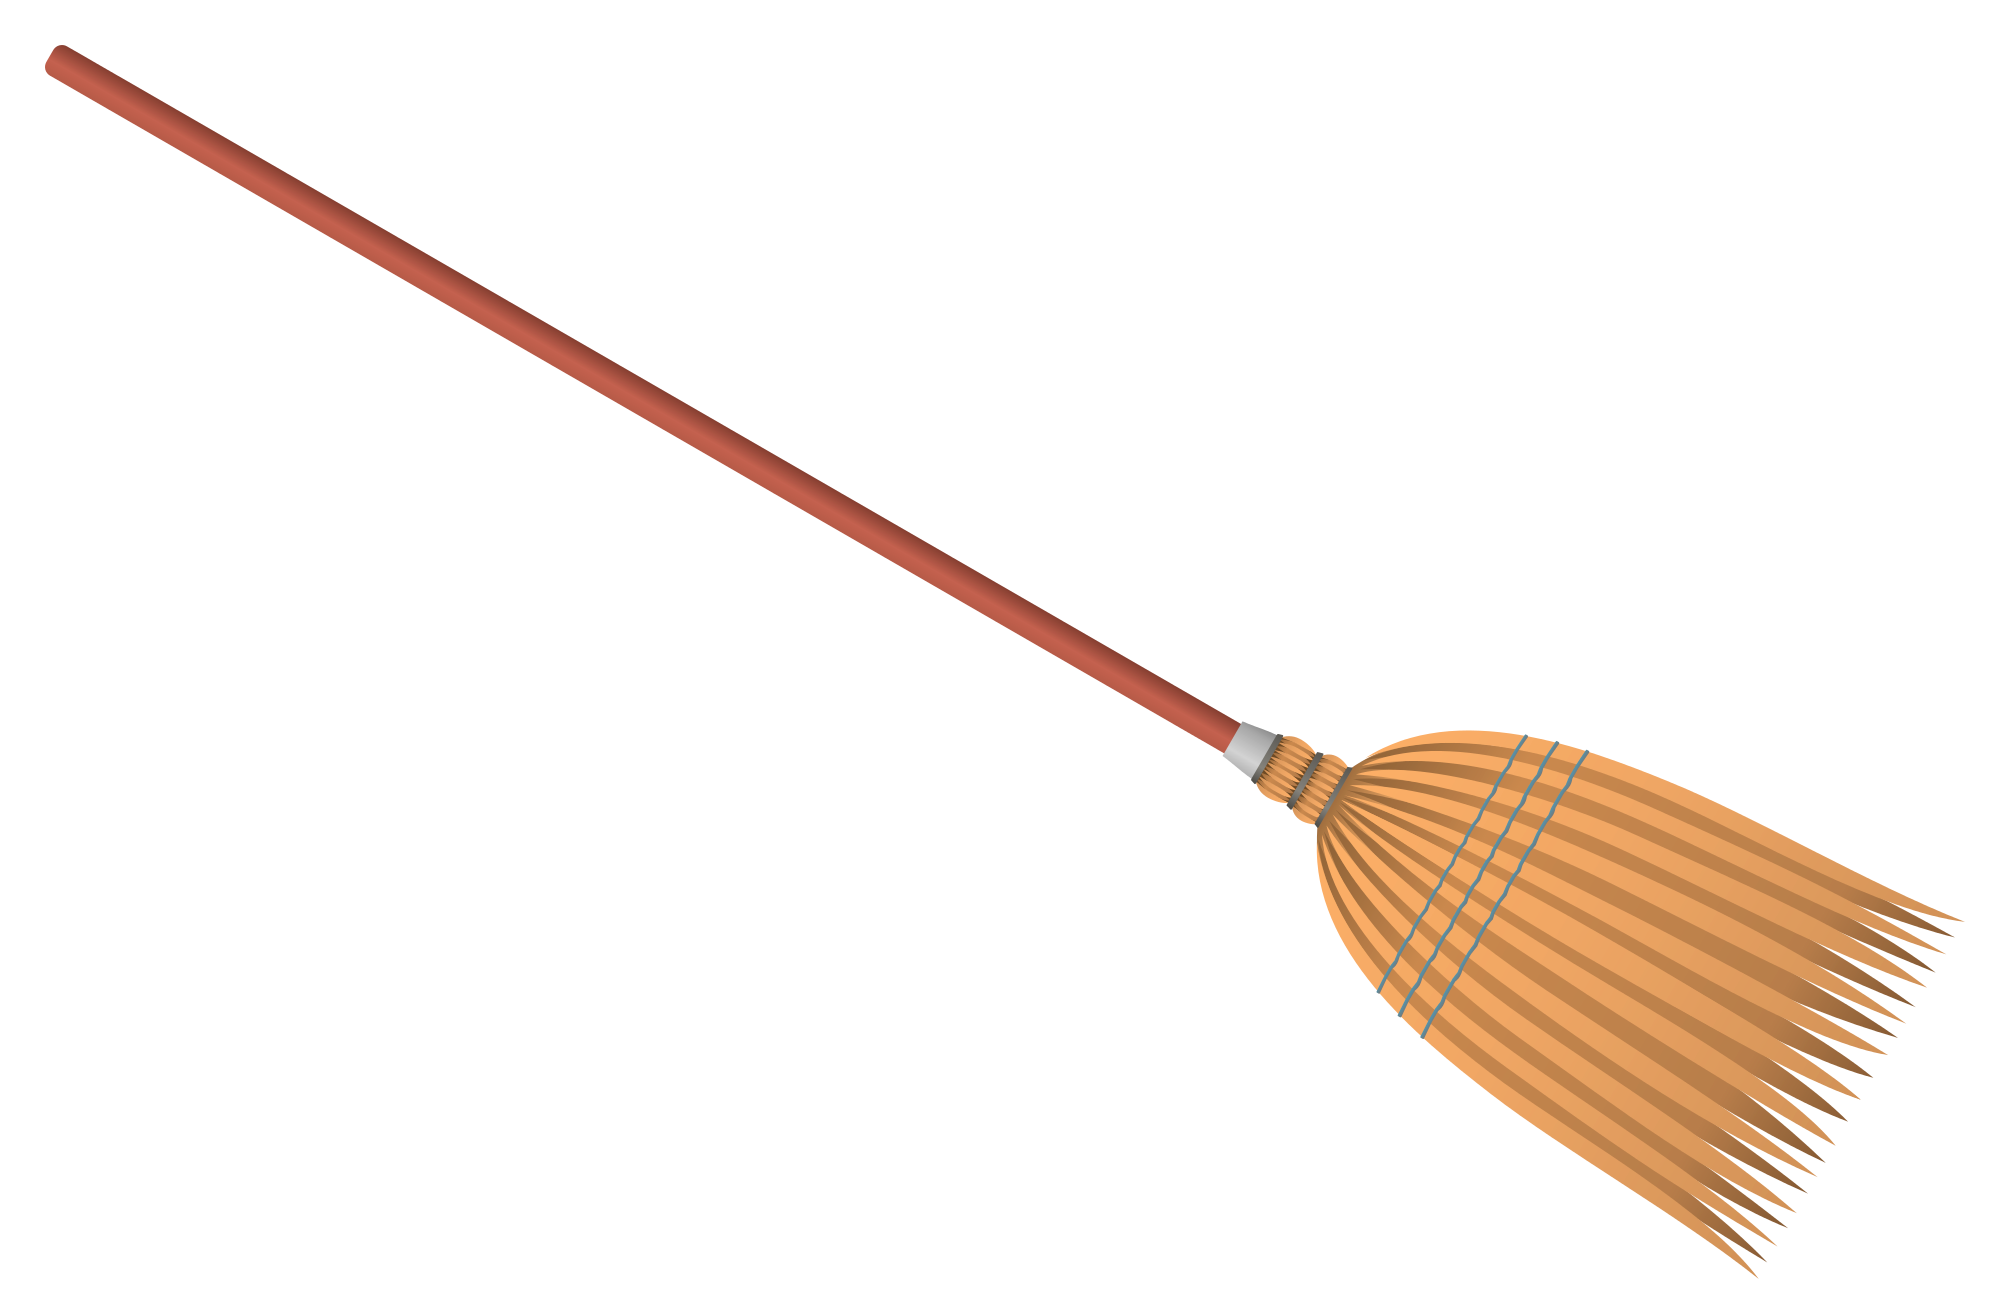 royalty free Broom PNG Image